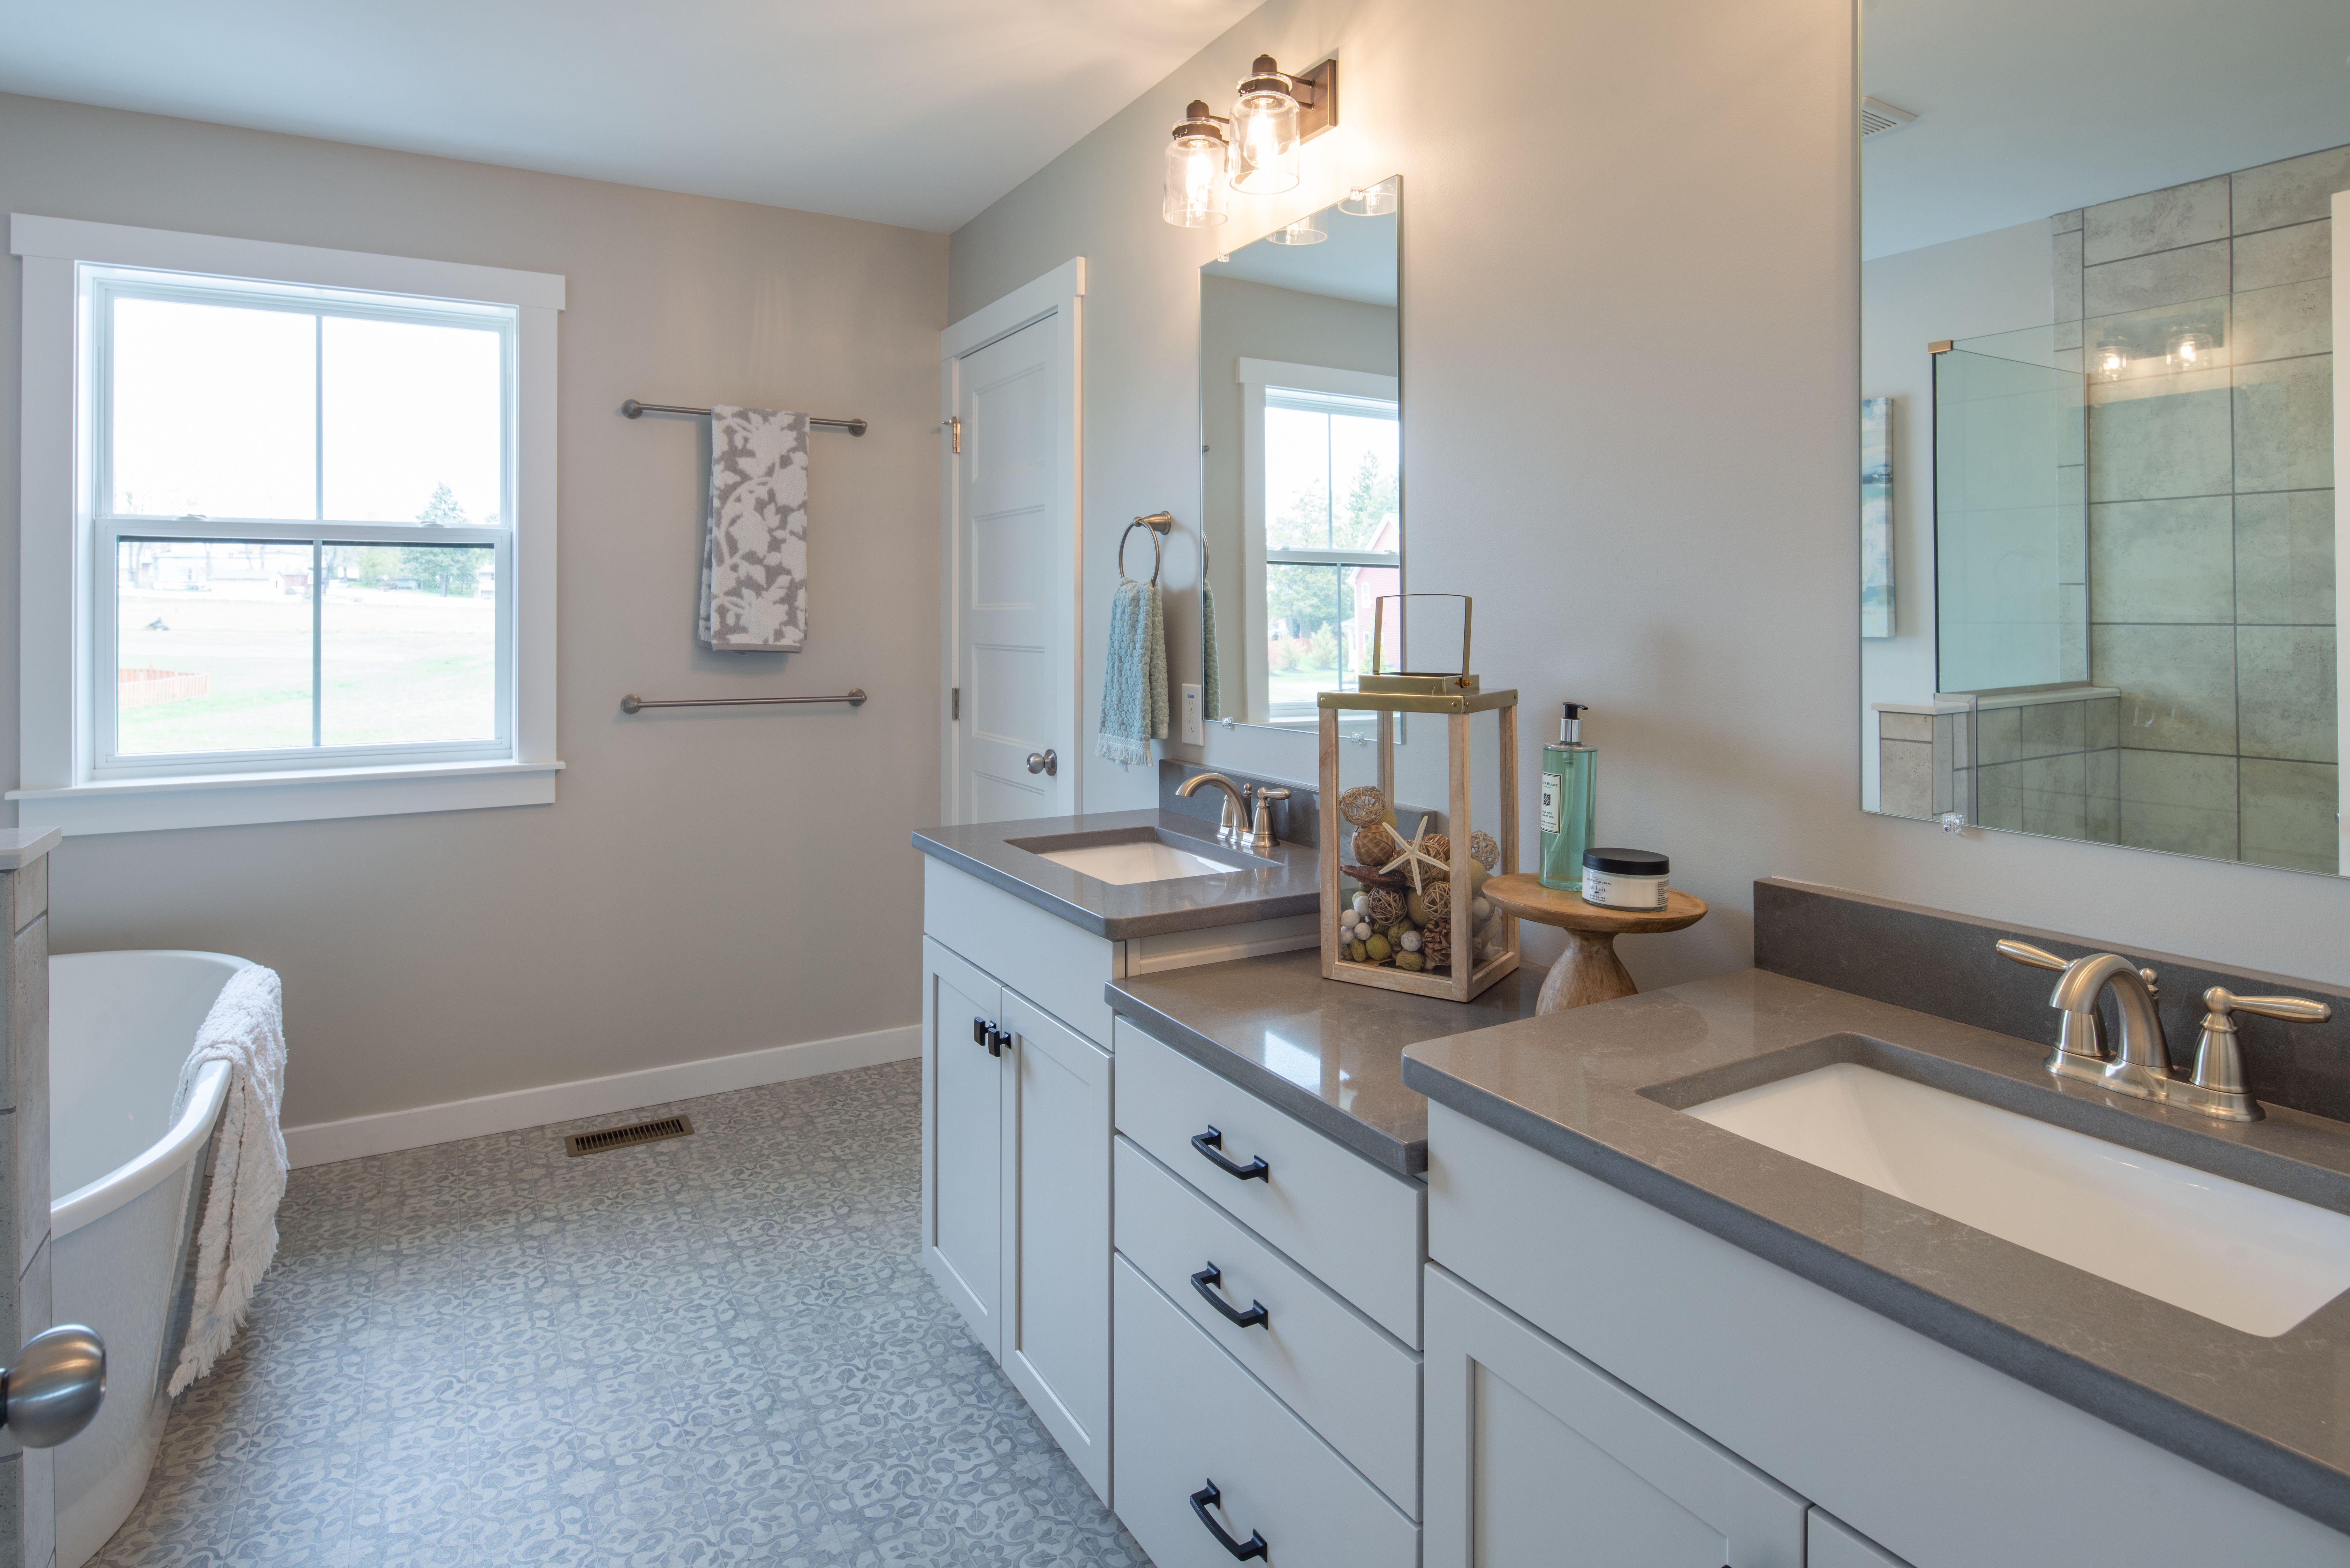 Bathroom featured in the Addison Farmhouse By Keystone Custom Homes in Philadelphia, PA